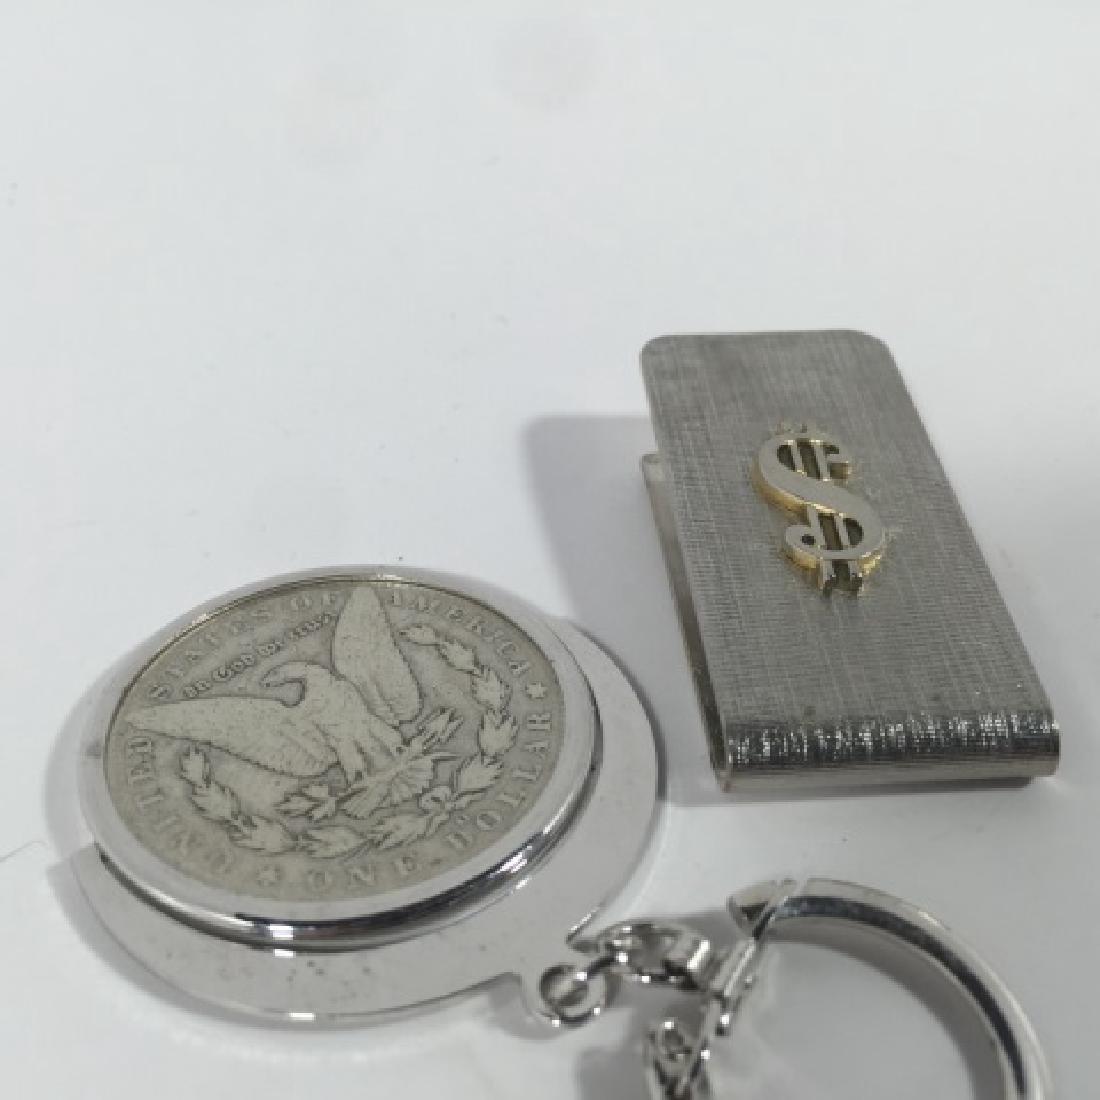 Antique 1886 US Dollar Key Chain & Money Clip - 2